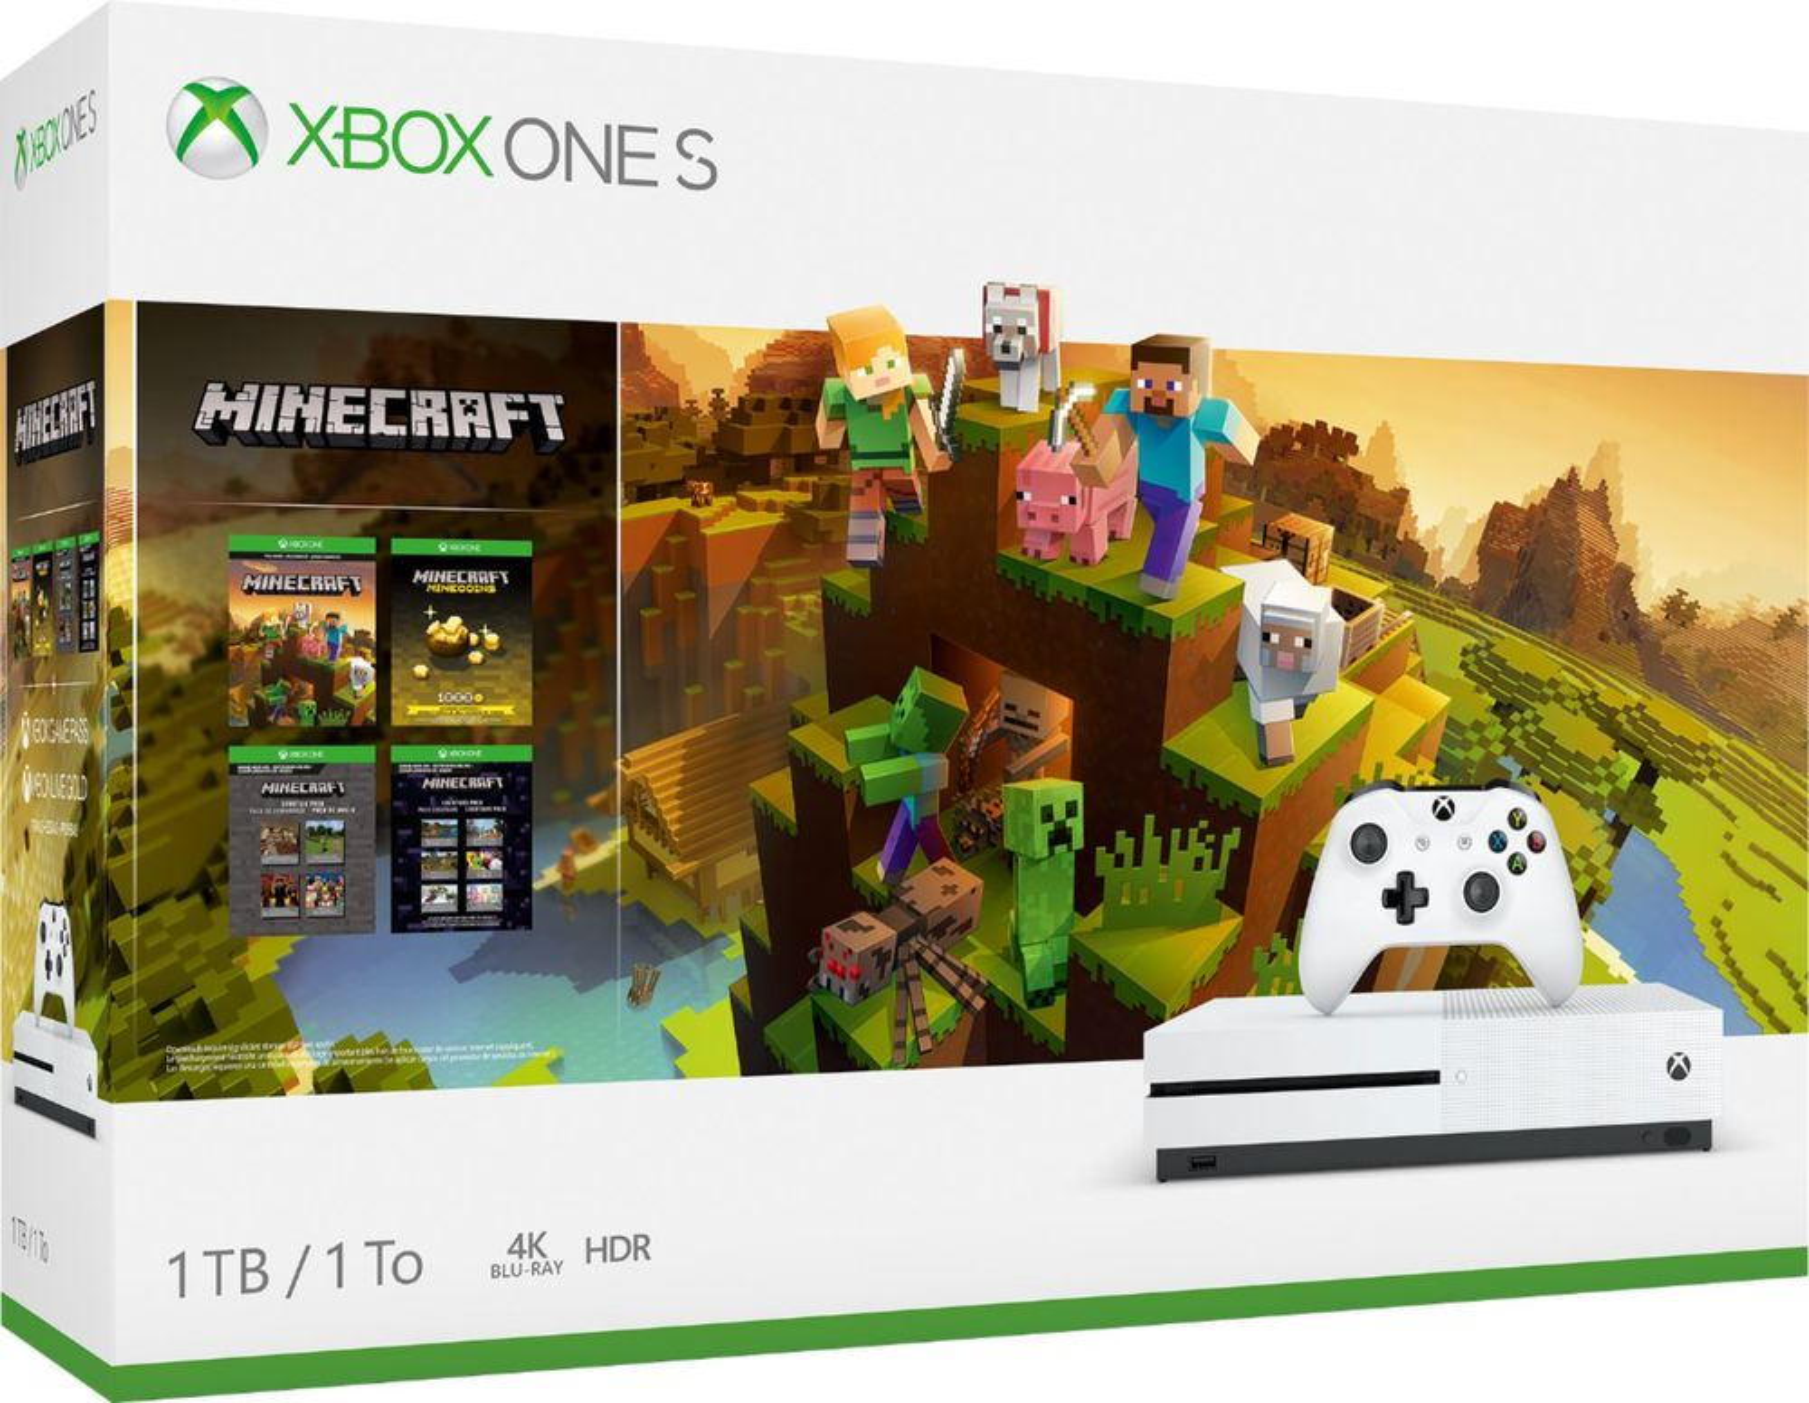 Microsoft - Xbox One S 1TB Minecraft Creators Bundle with 4K Ultra HD Blu-ray - White